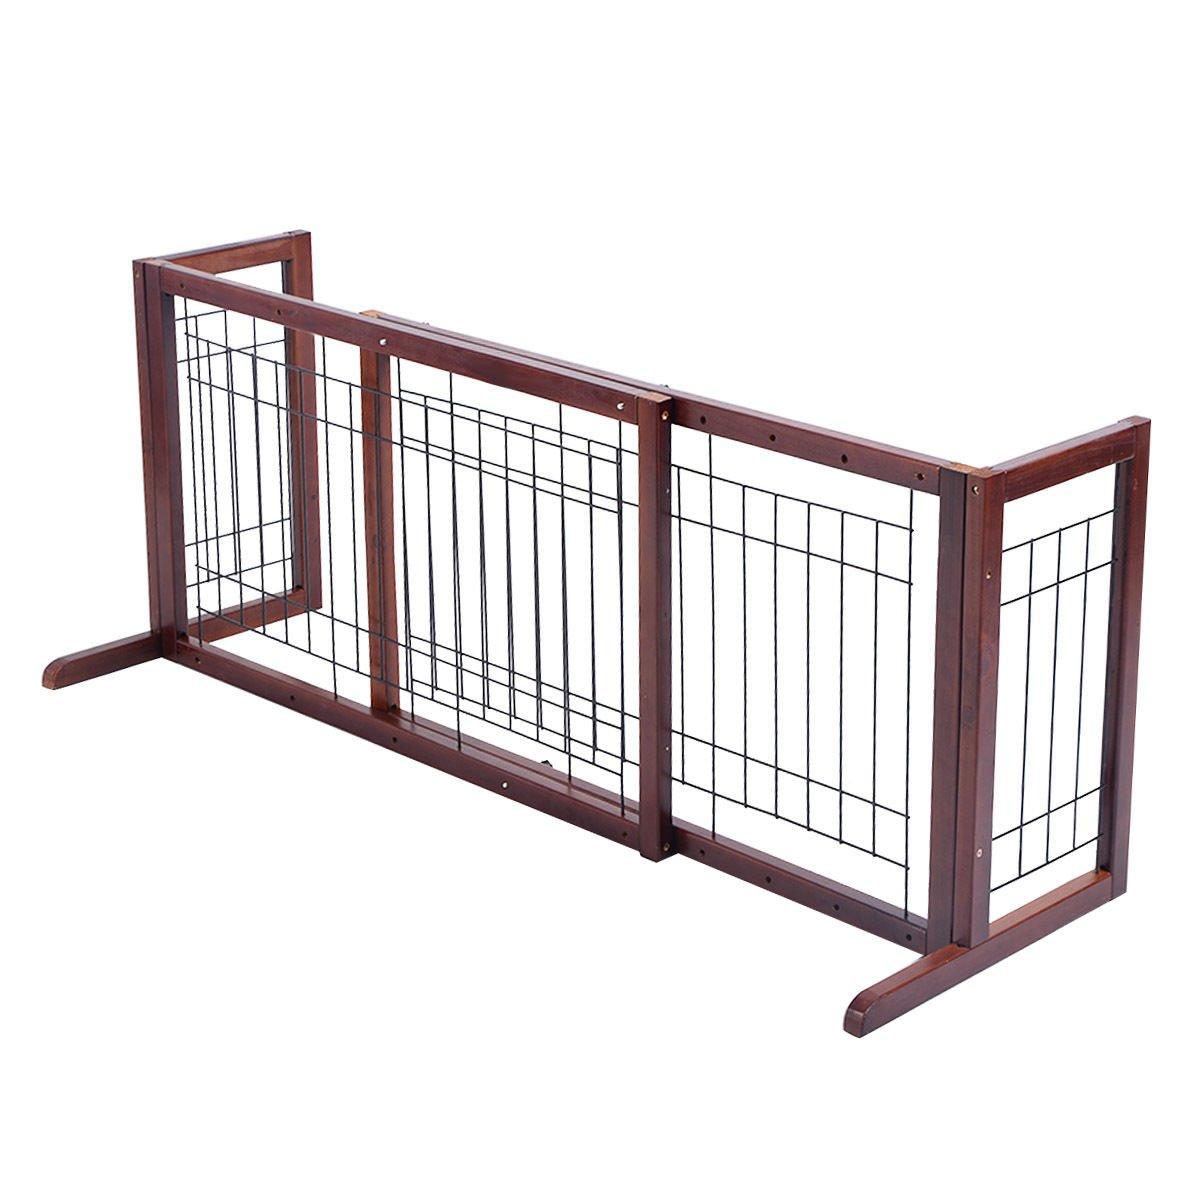 Giantex Wood Dog Gate Adjustable Indoor Solid Construction Pet Fence Playpen Free Stand